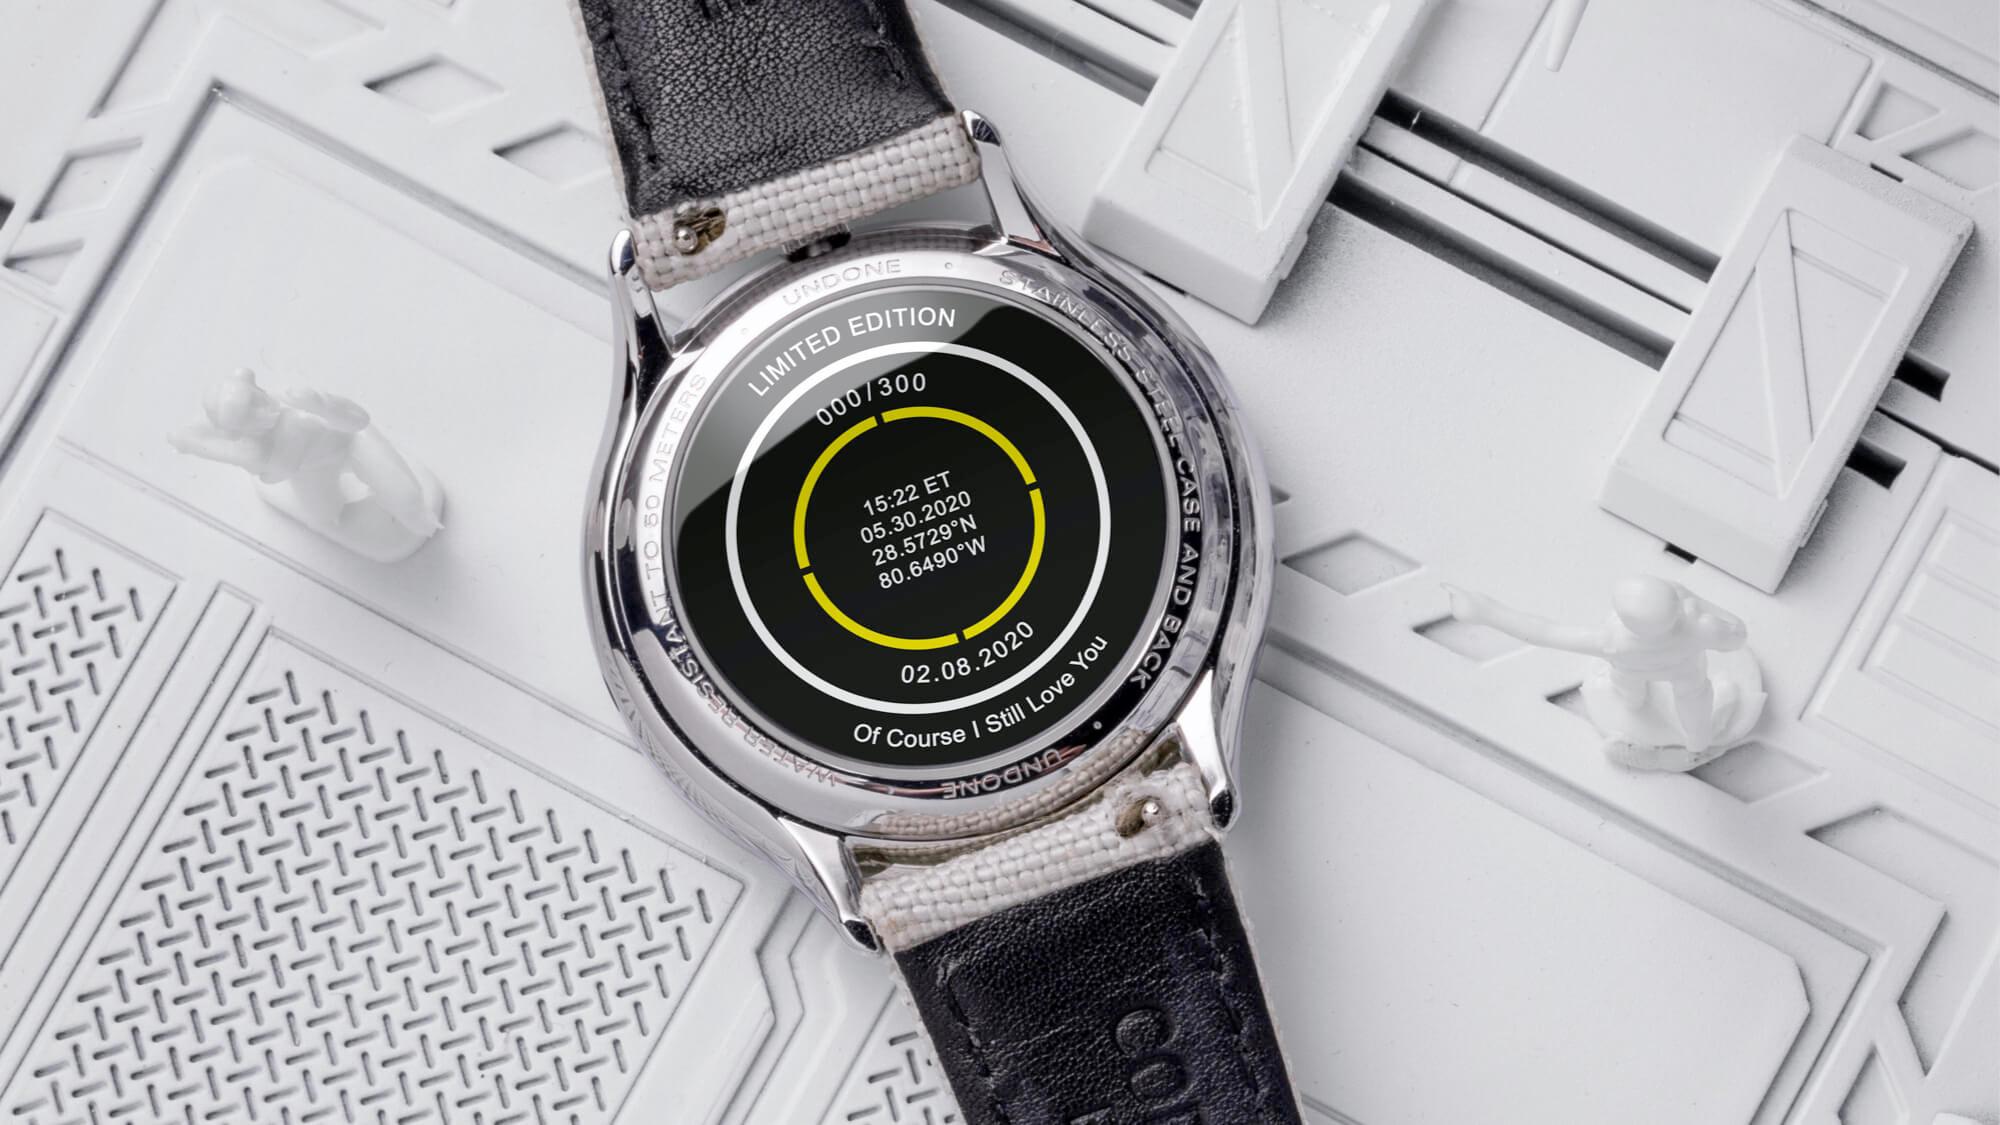 SpaceXplorer Watch